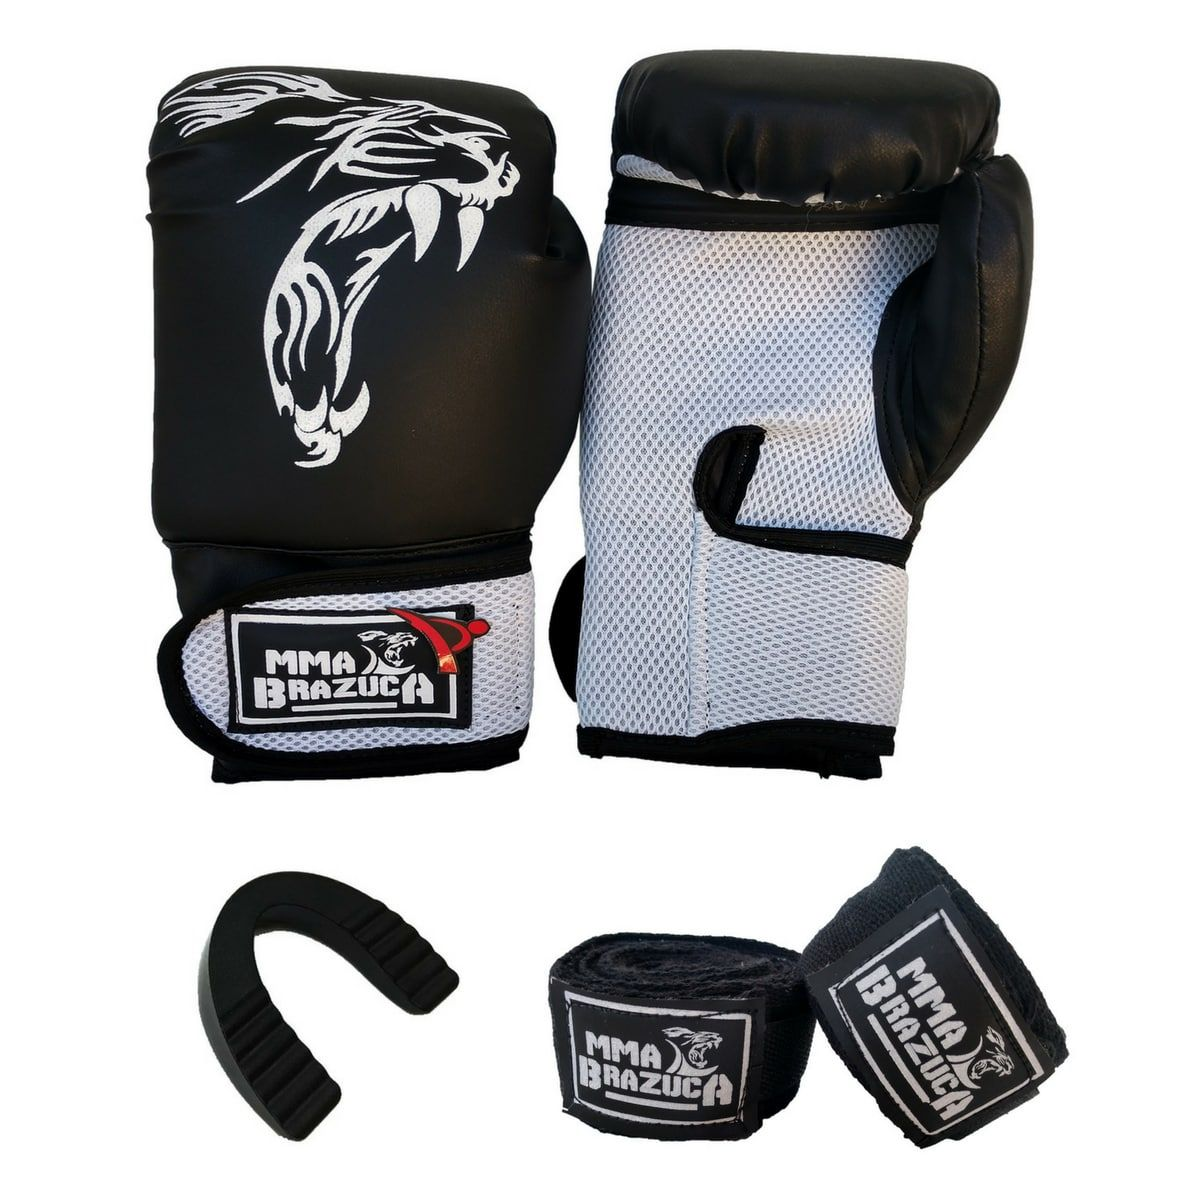 Kit de Boxe / Muay Thai 12oz - Preto com Branco - MMA Brazuka  - PRALUTA SHOP